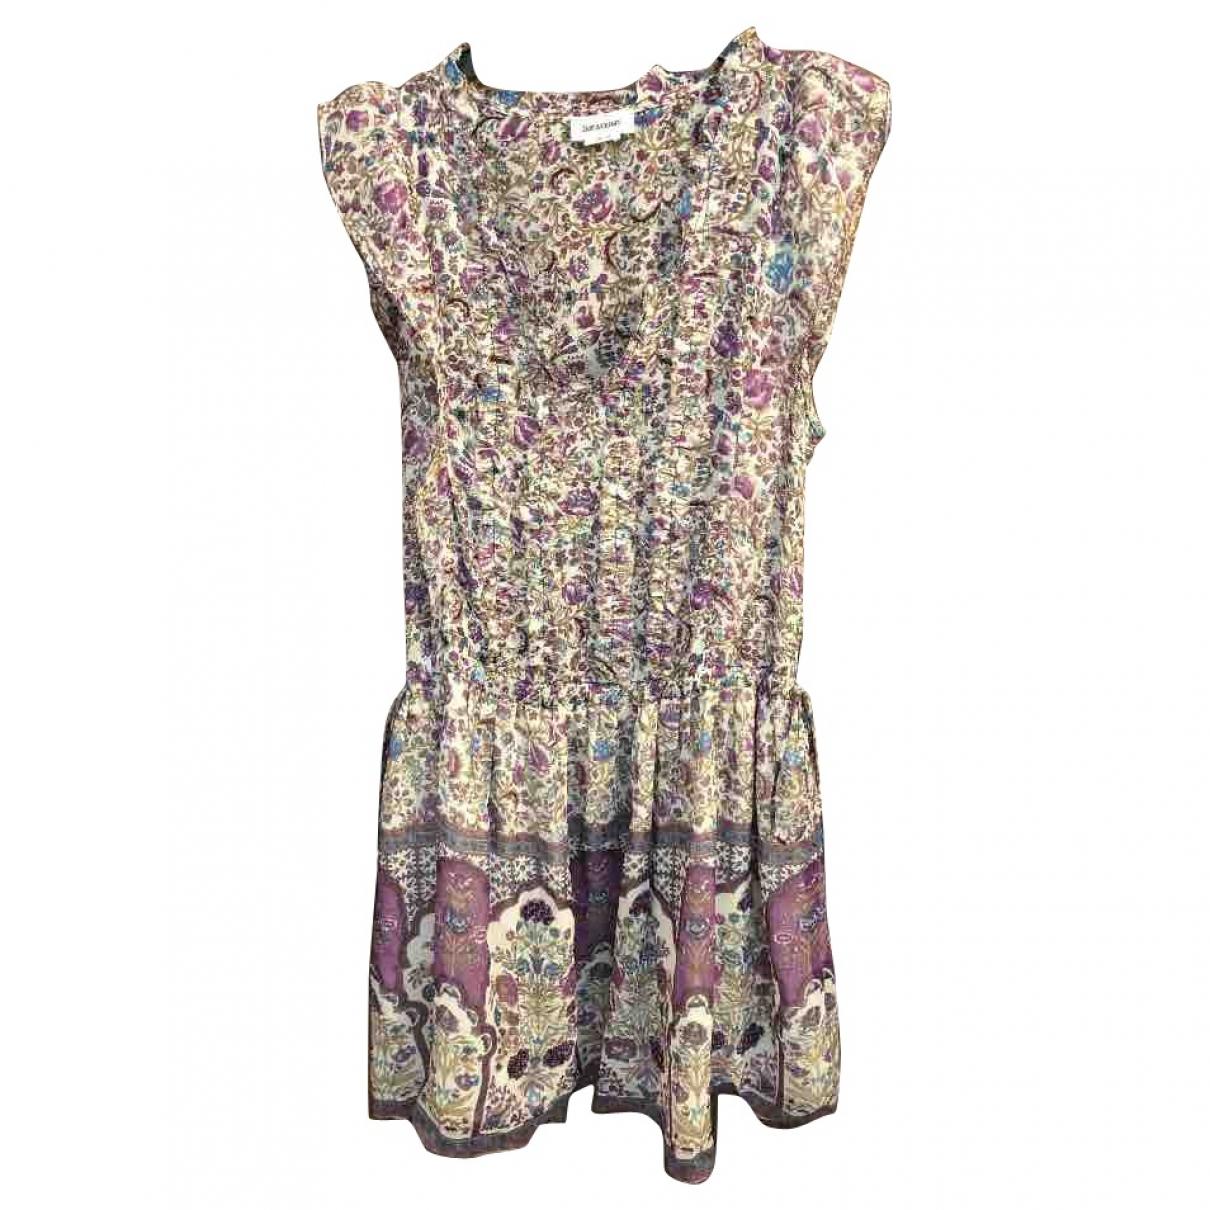 Zadig & Voltaire \N dress for Women XS